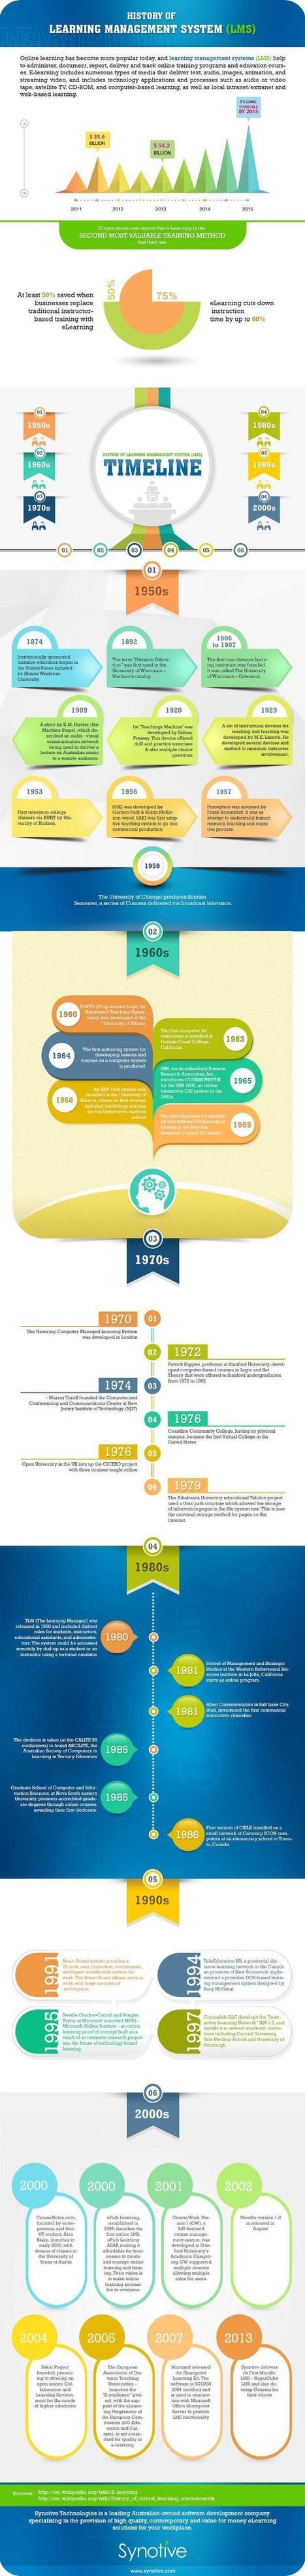 Learning Management System Timeline Infographic - e-Learning Infographics   The information Edge   Scoop.it